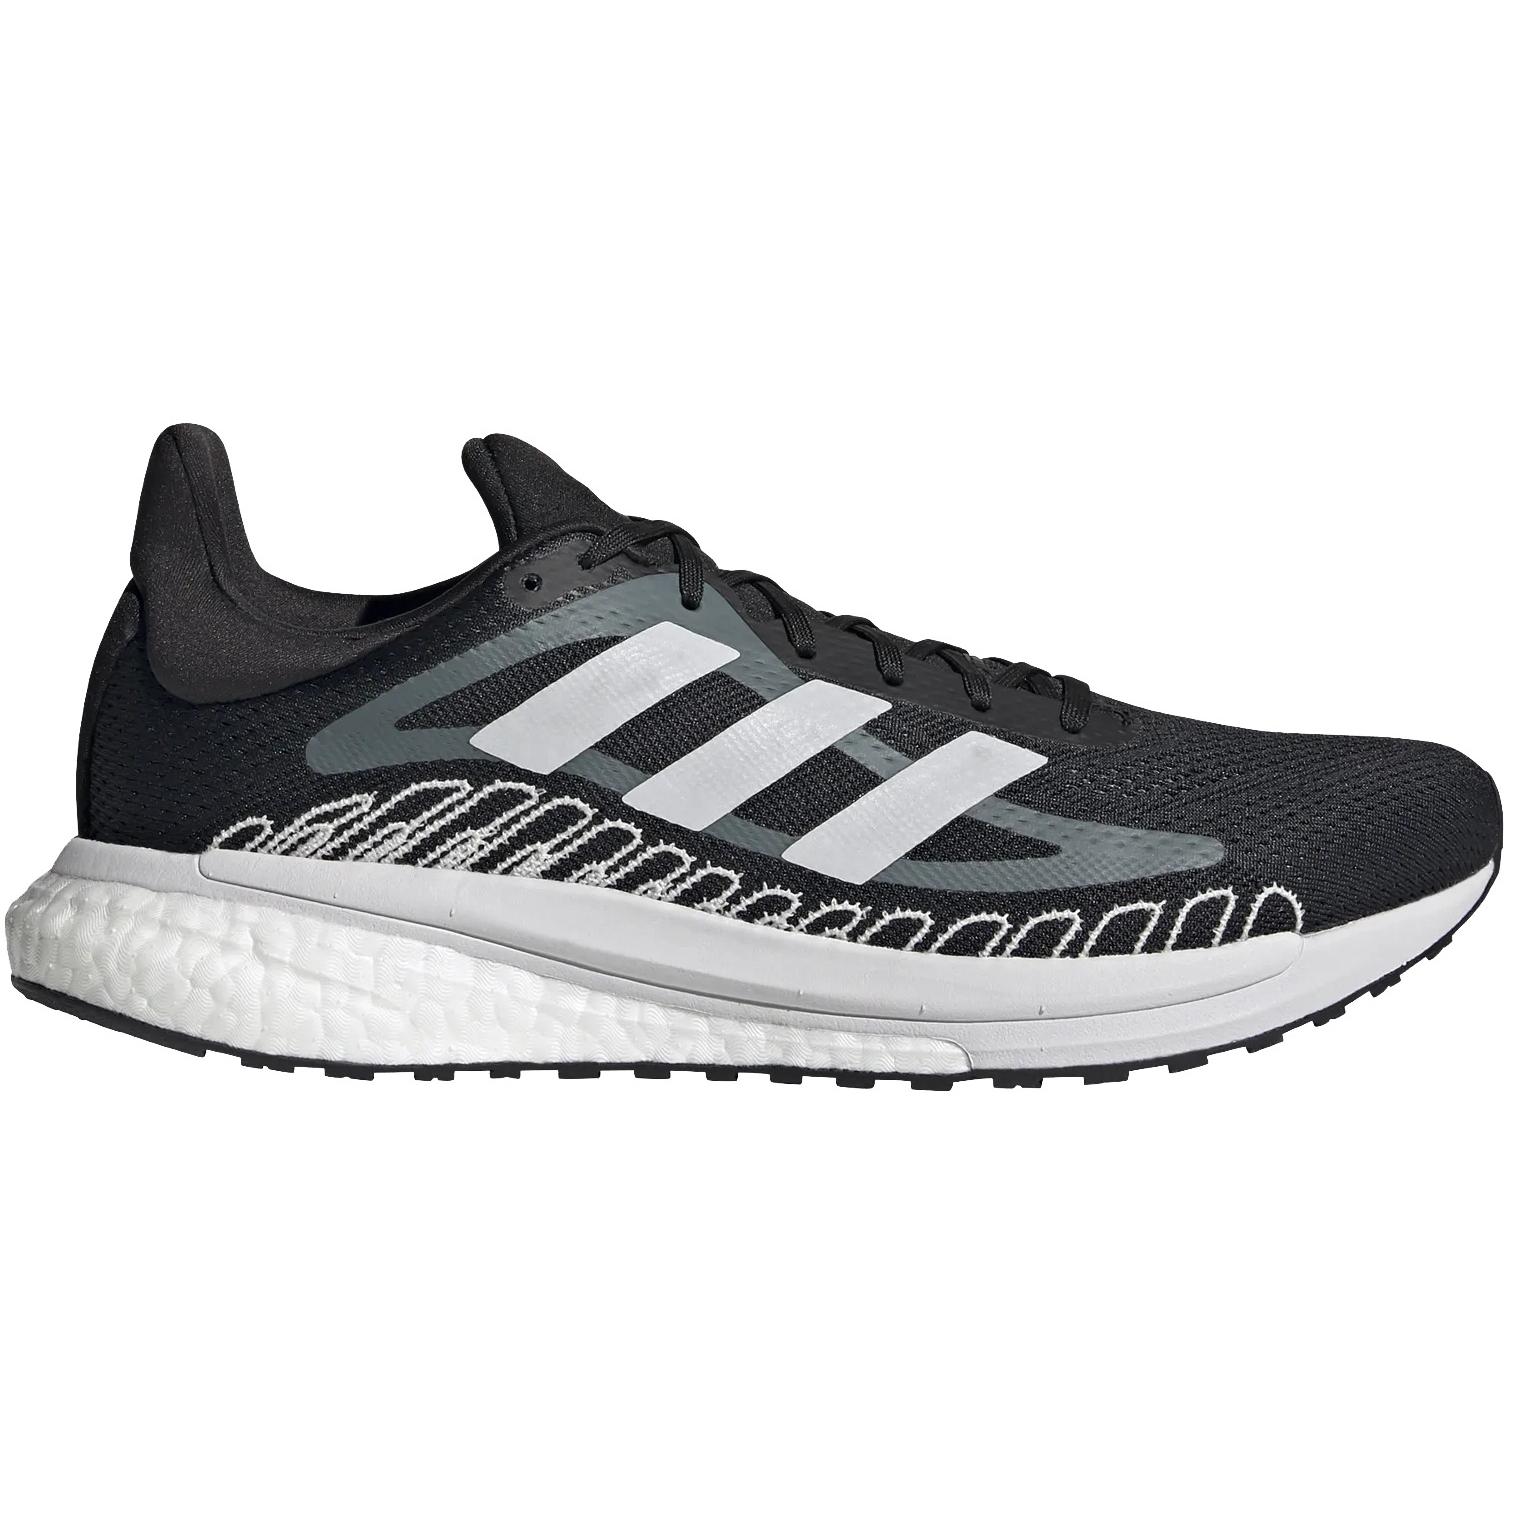 adidas Männer SolarGlide ST Laufschuhe - core black/cloud white/blue oxide FW1005